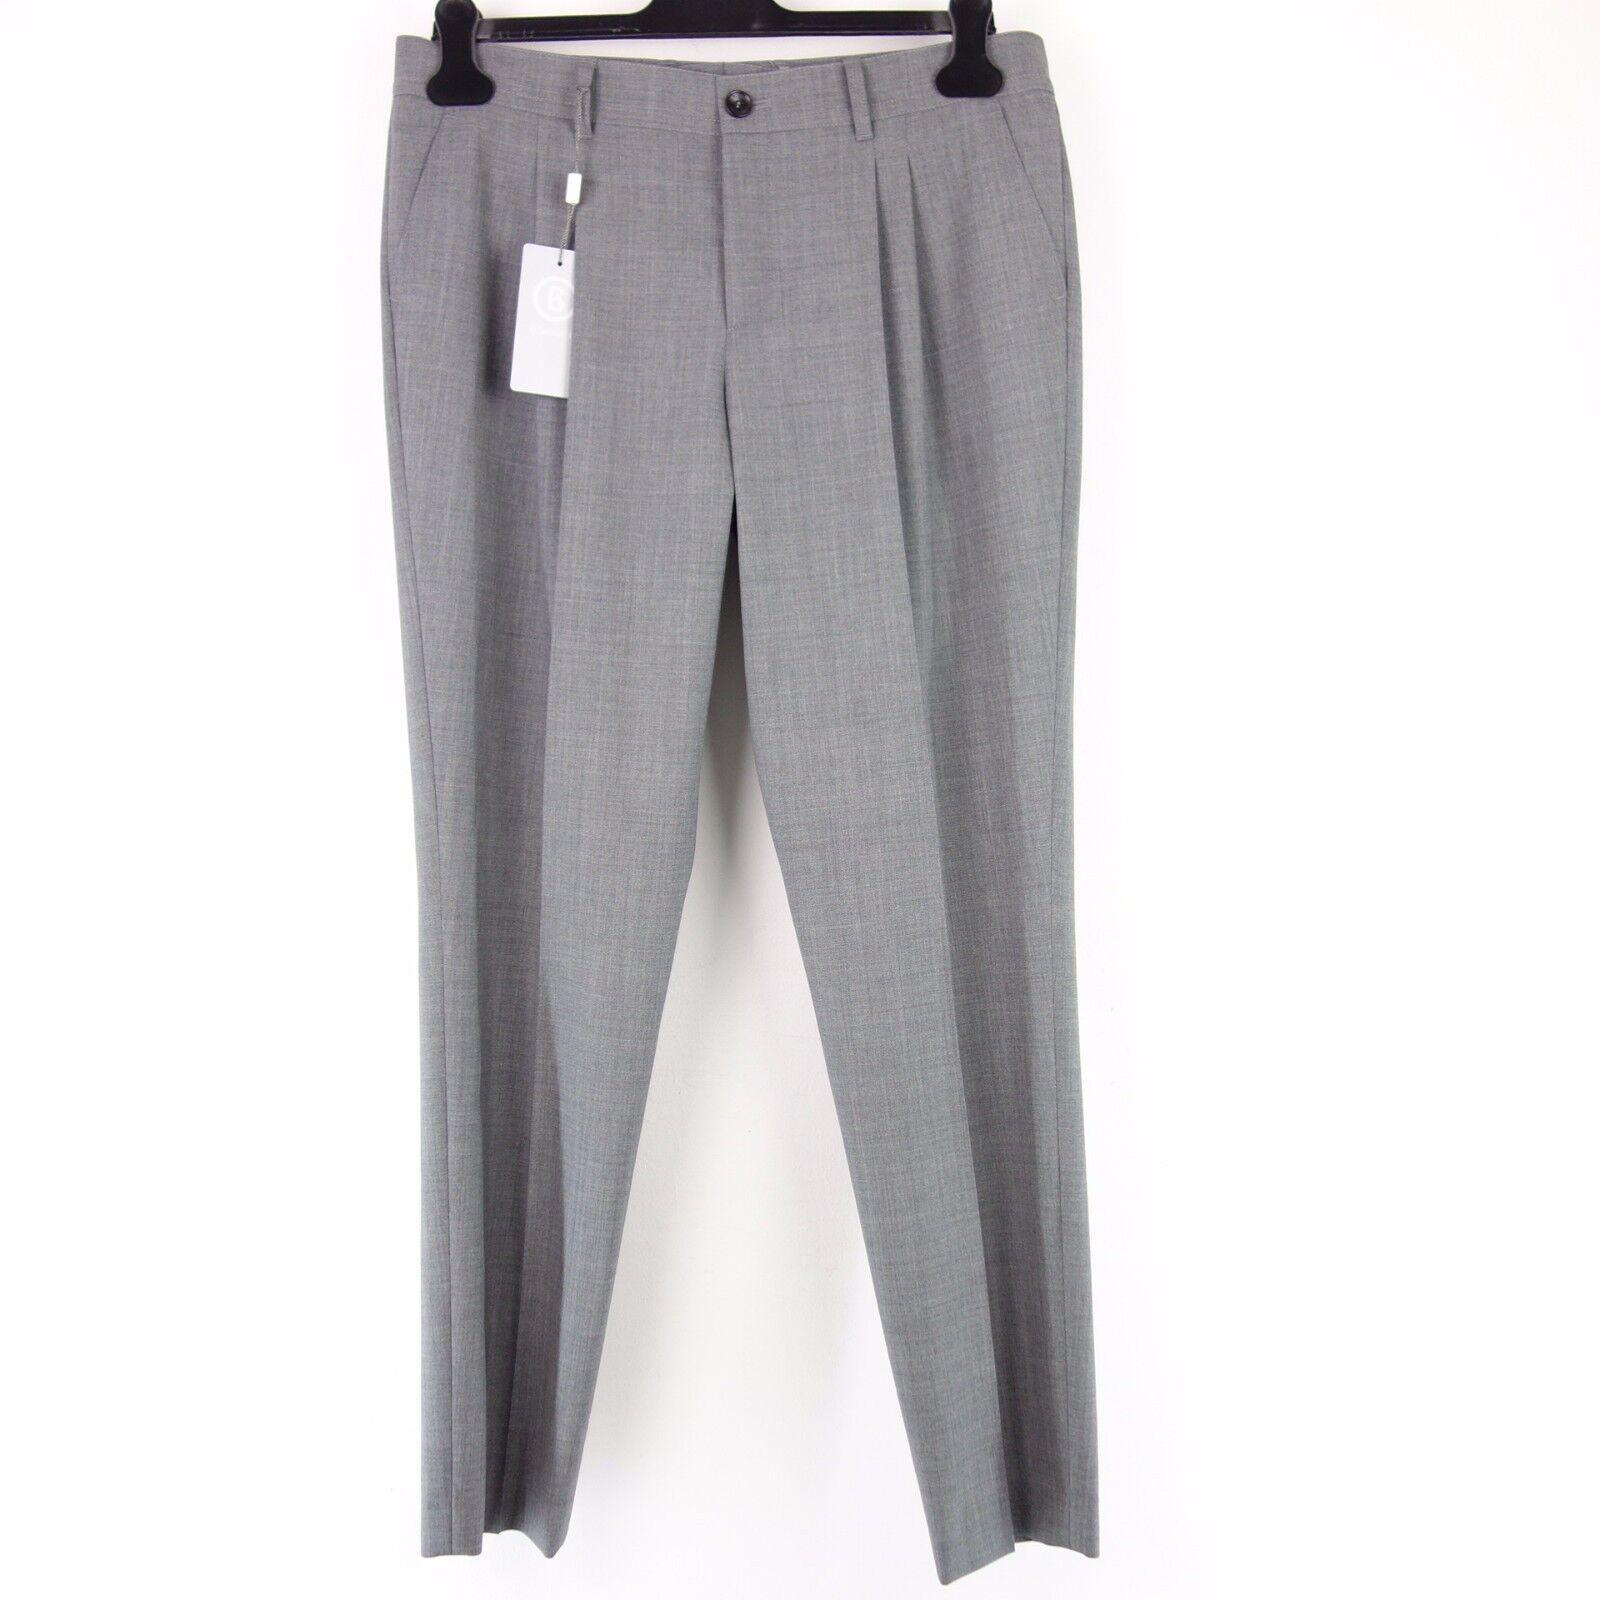 Bogner Women Pants Reese 131 2 12FT L Grey Virgin Wool Cloth Trousers Classic